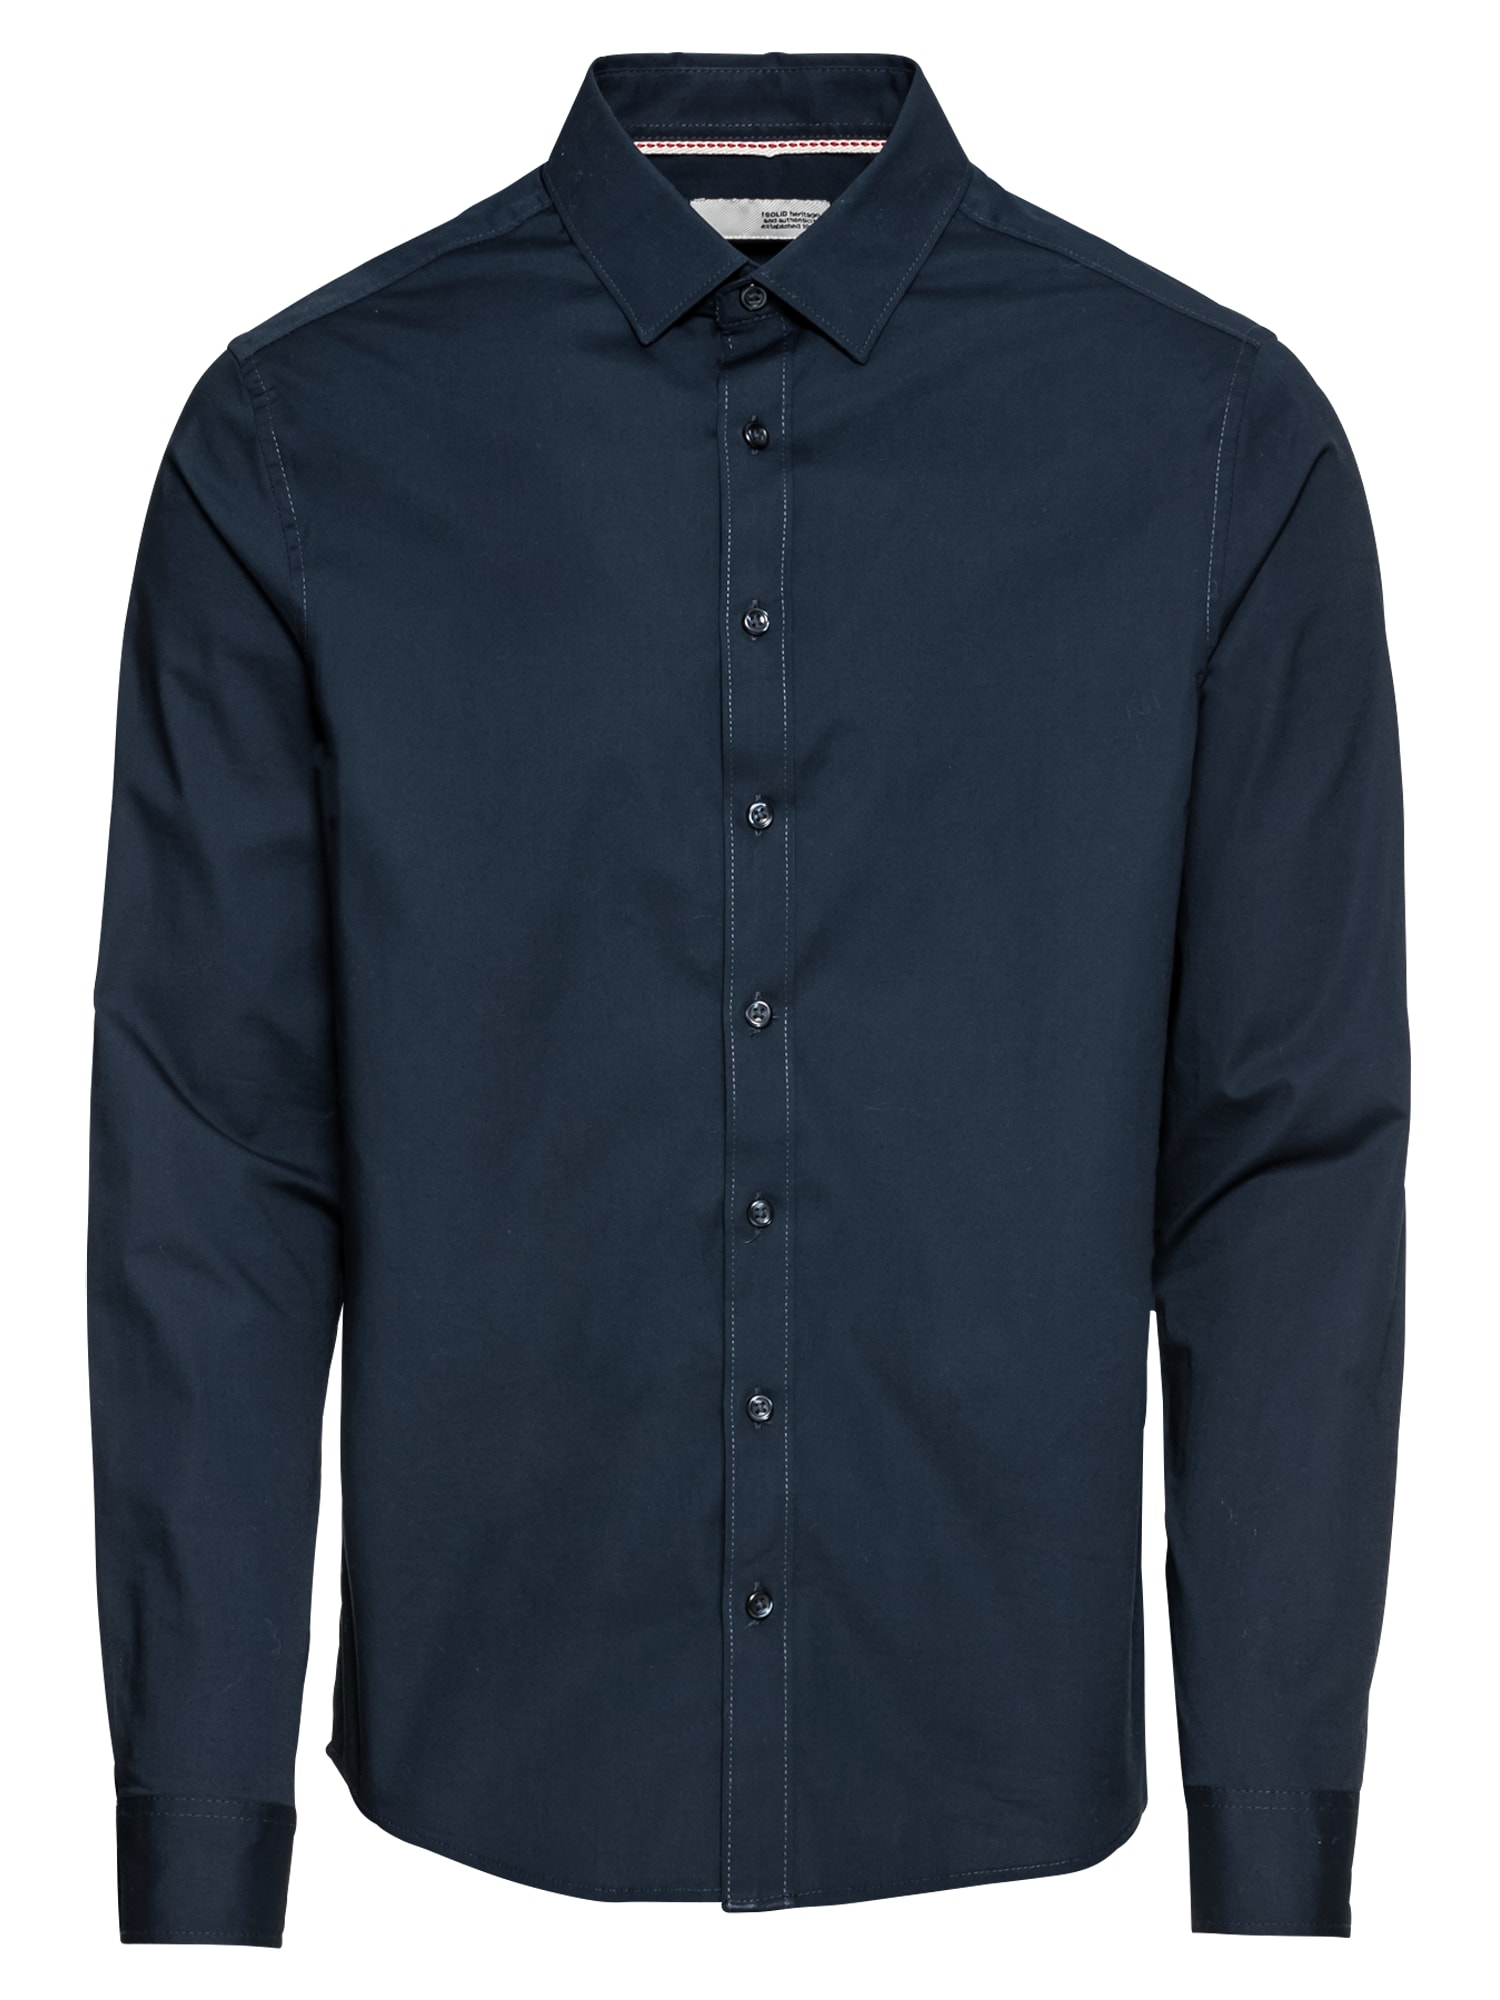 Košile Shirt - Tyler LS tmavě modrá !Solid